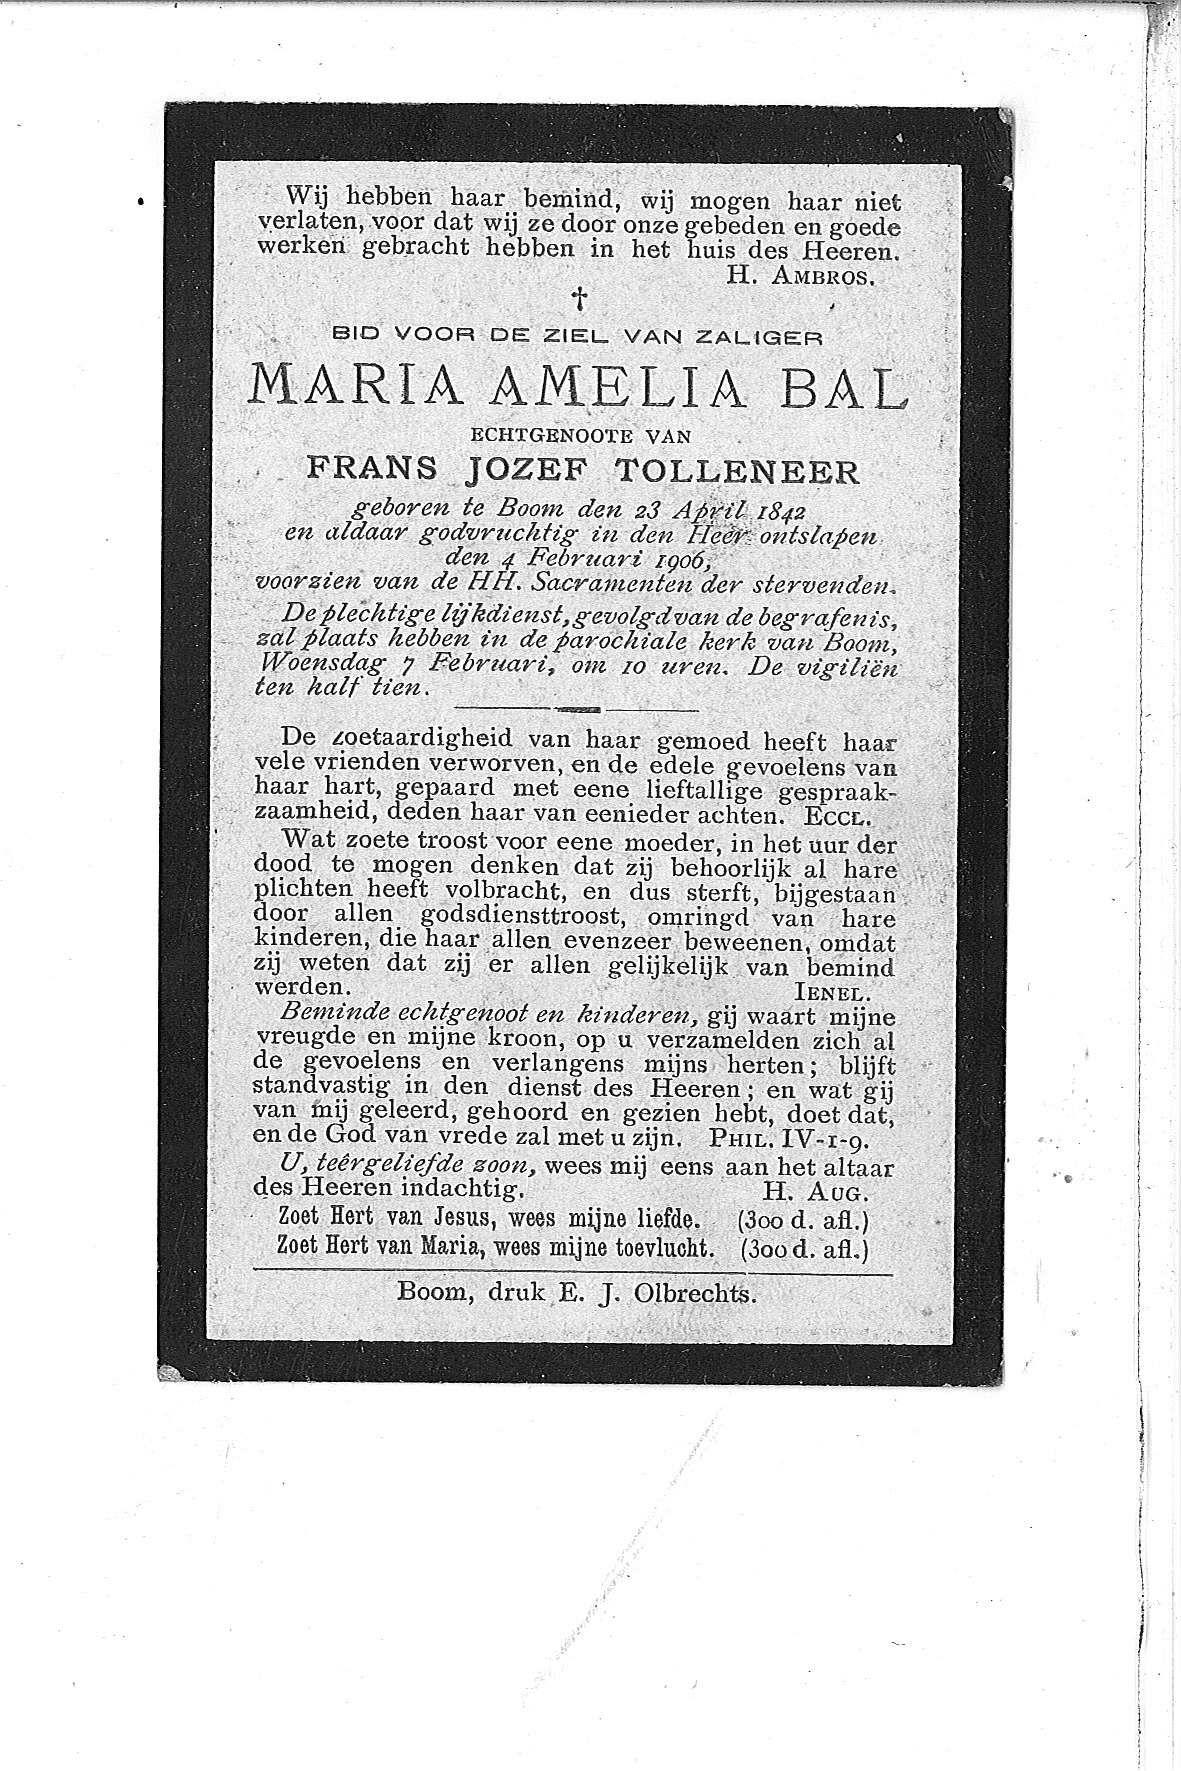 Maria-Amelia(1906)20101006151440_00001.jpg